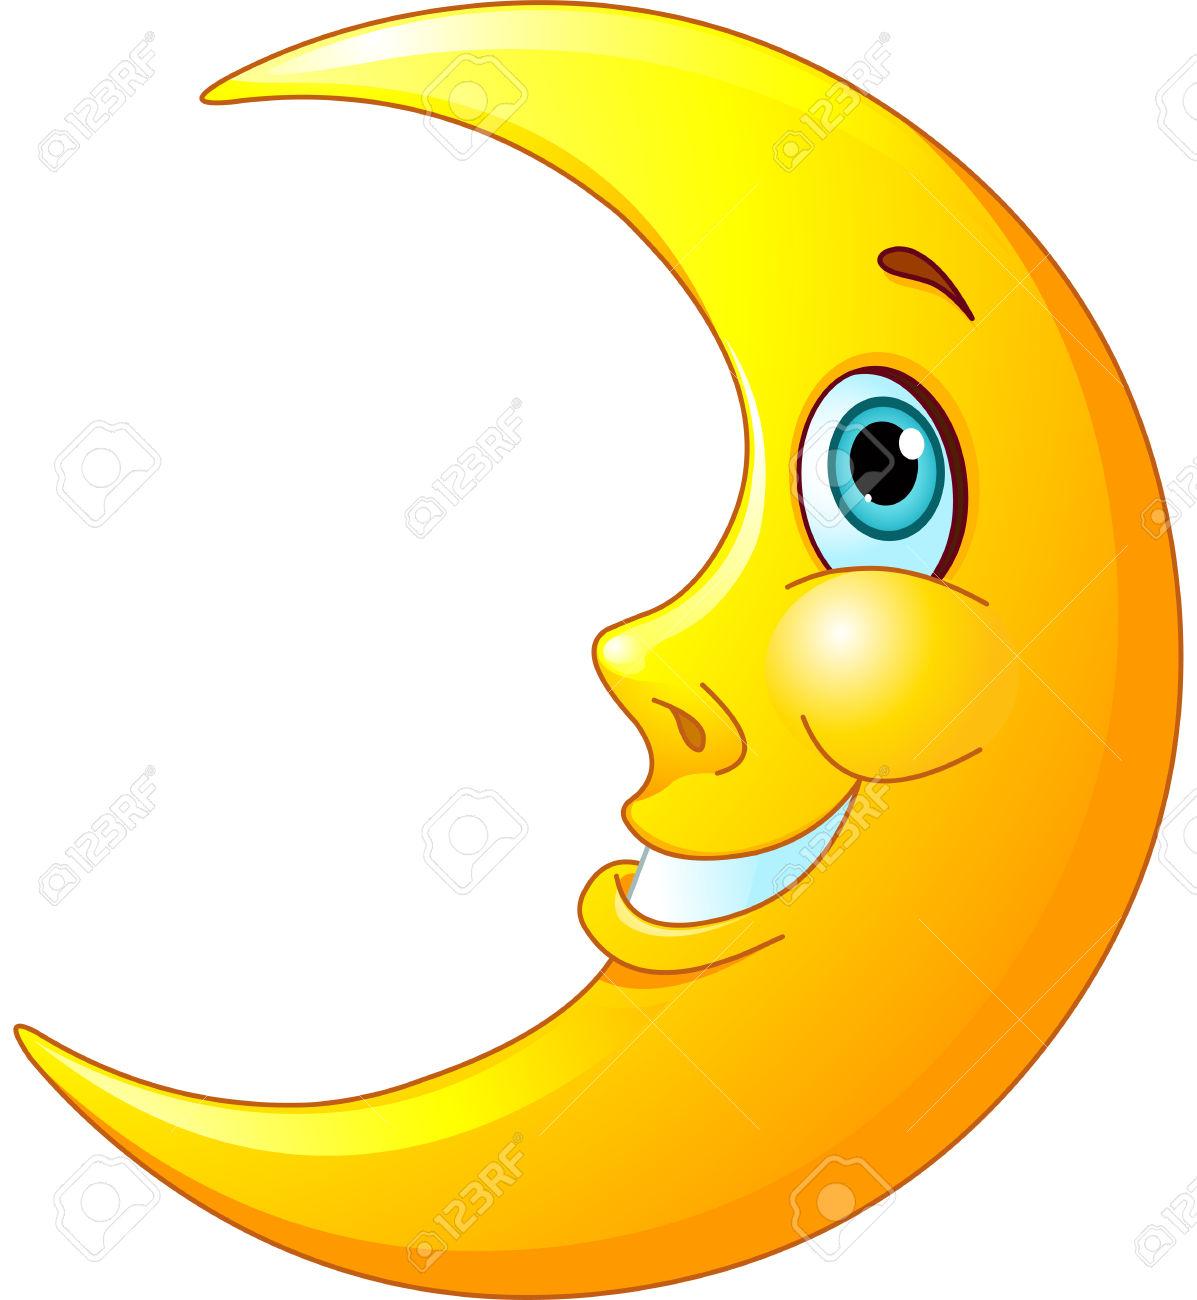 1197x1300 Lunar Clipart Happy